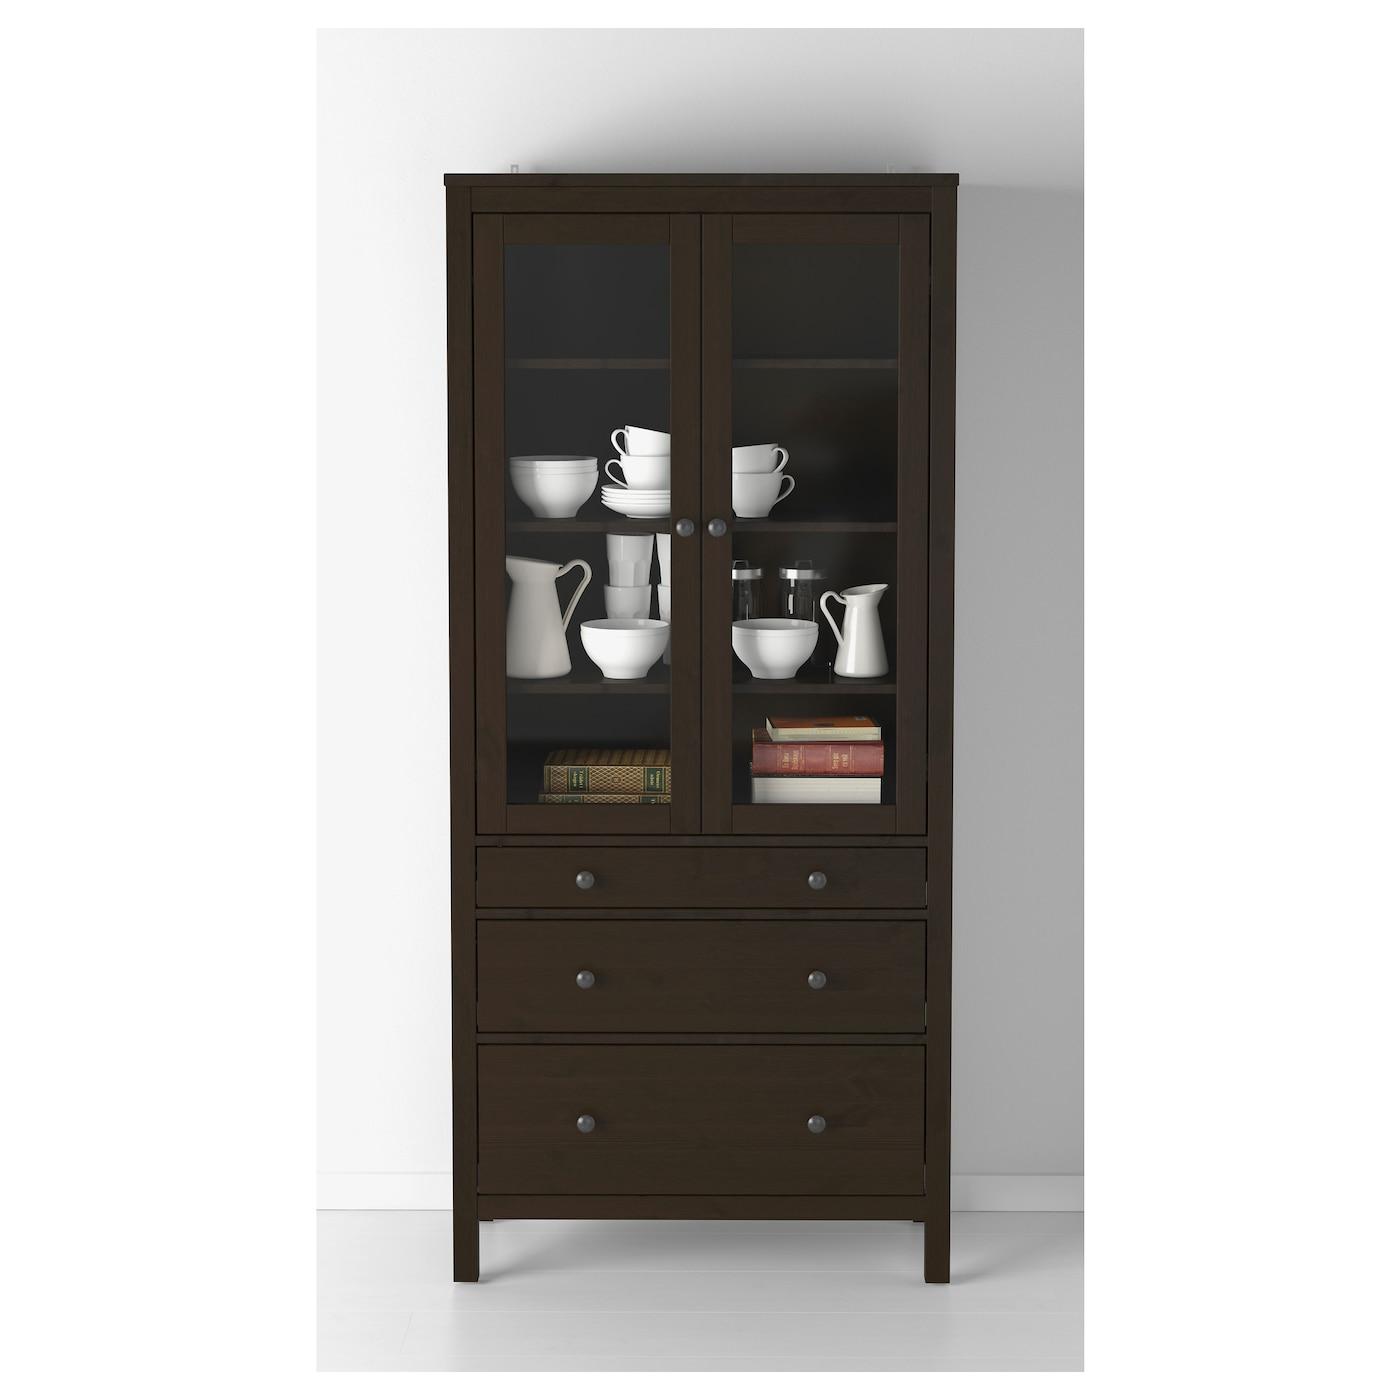 hemnes glass door cabinet with 3 drawers black brown. Black Bedroom Furniture Sets. Home Design Ideas